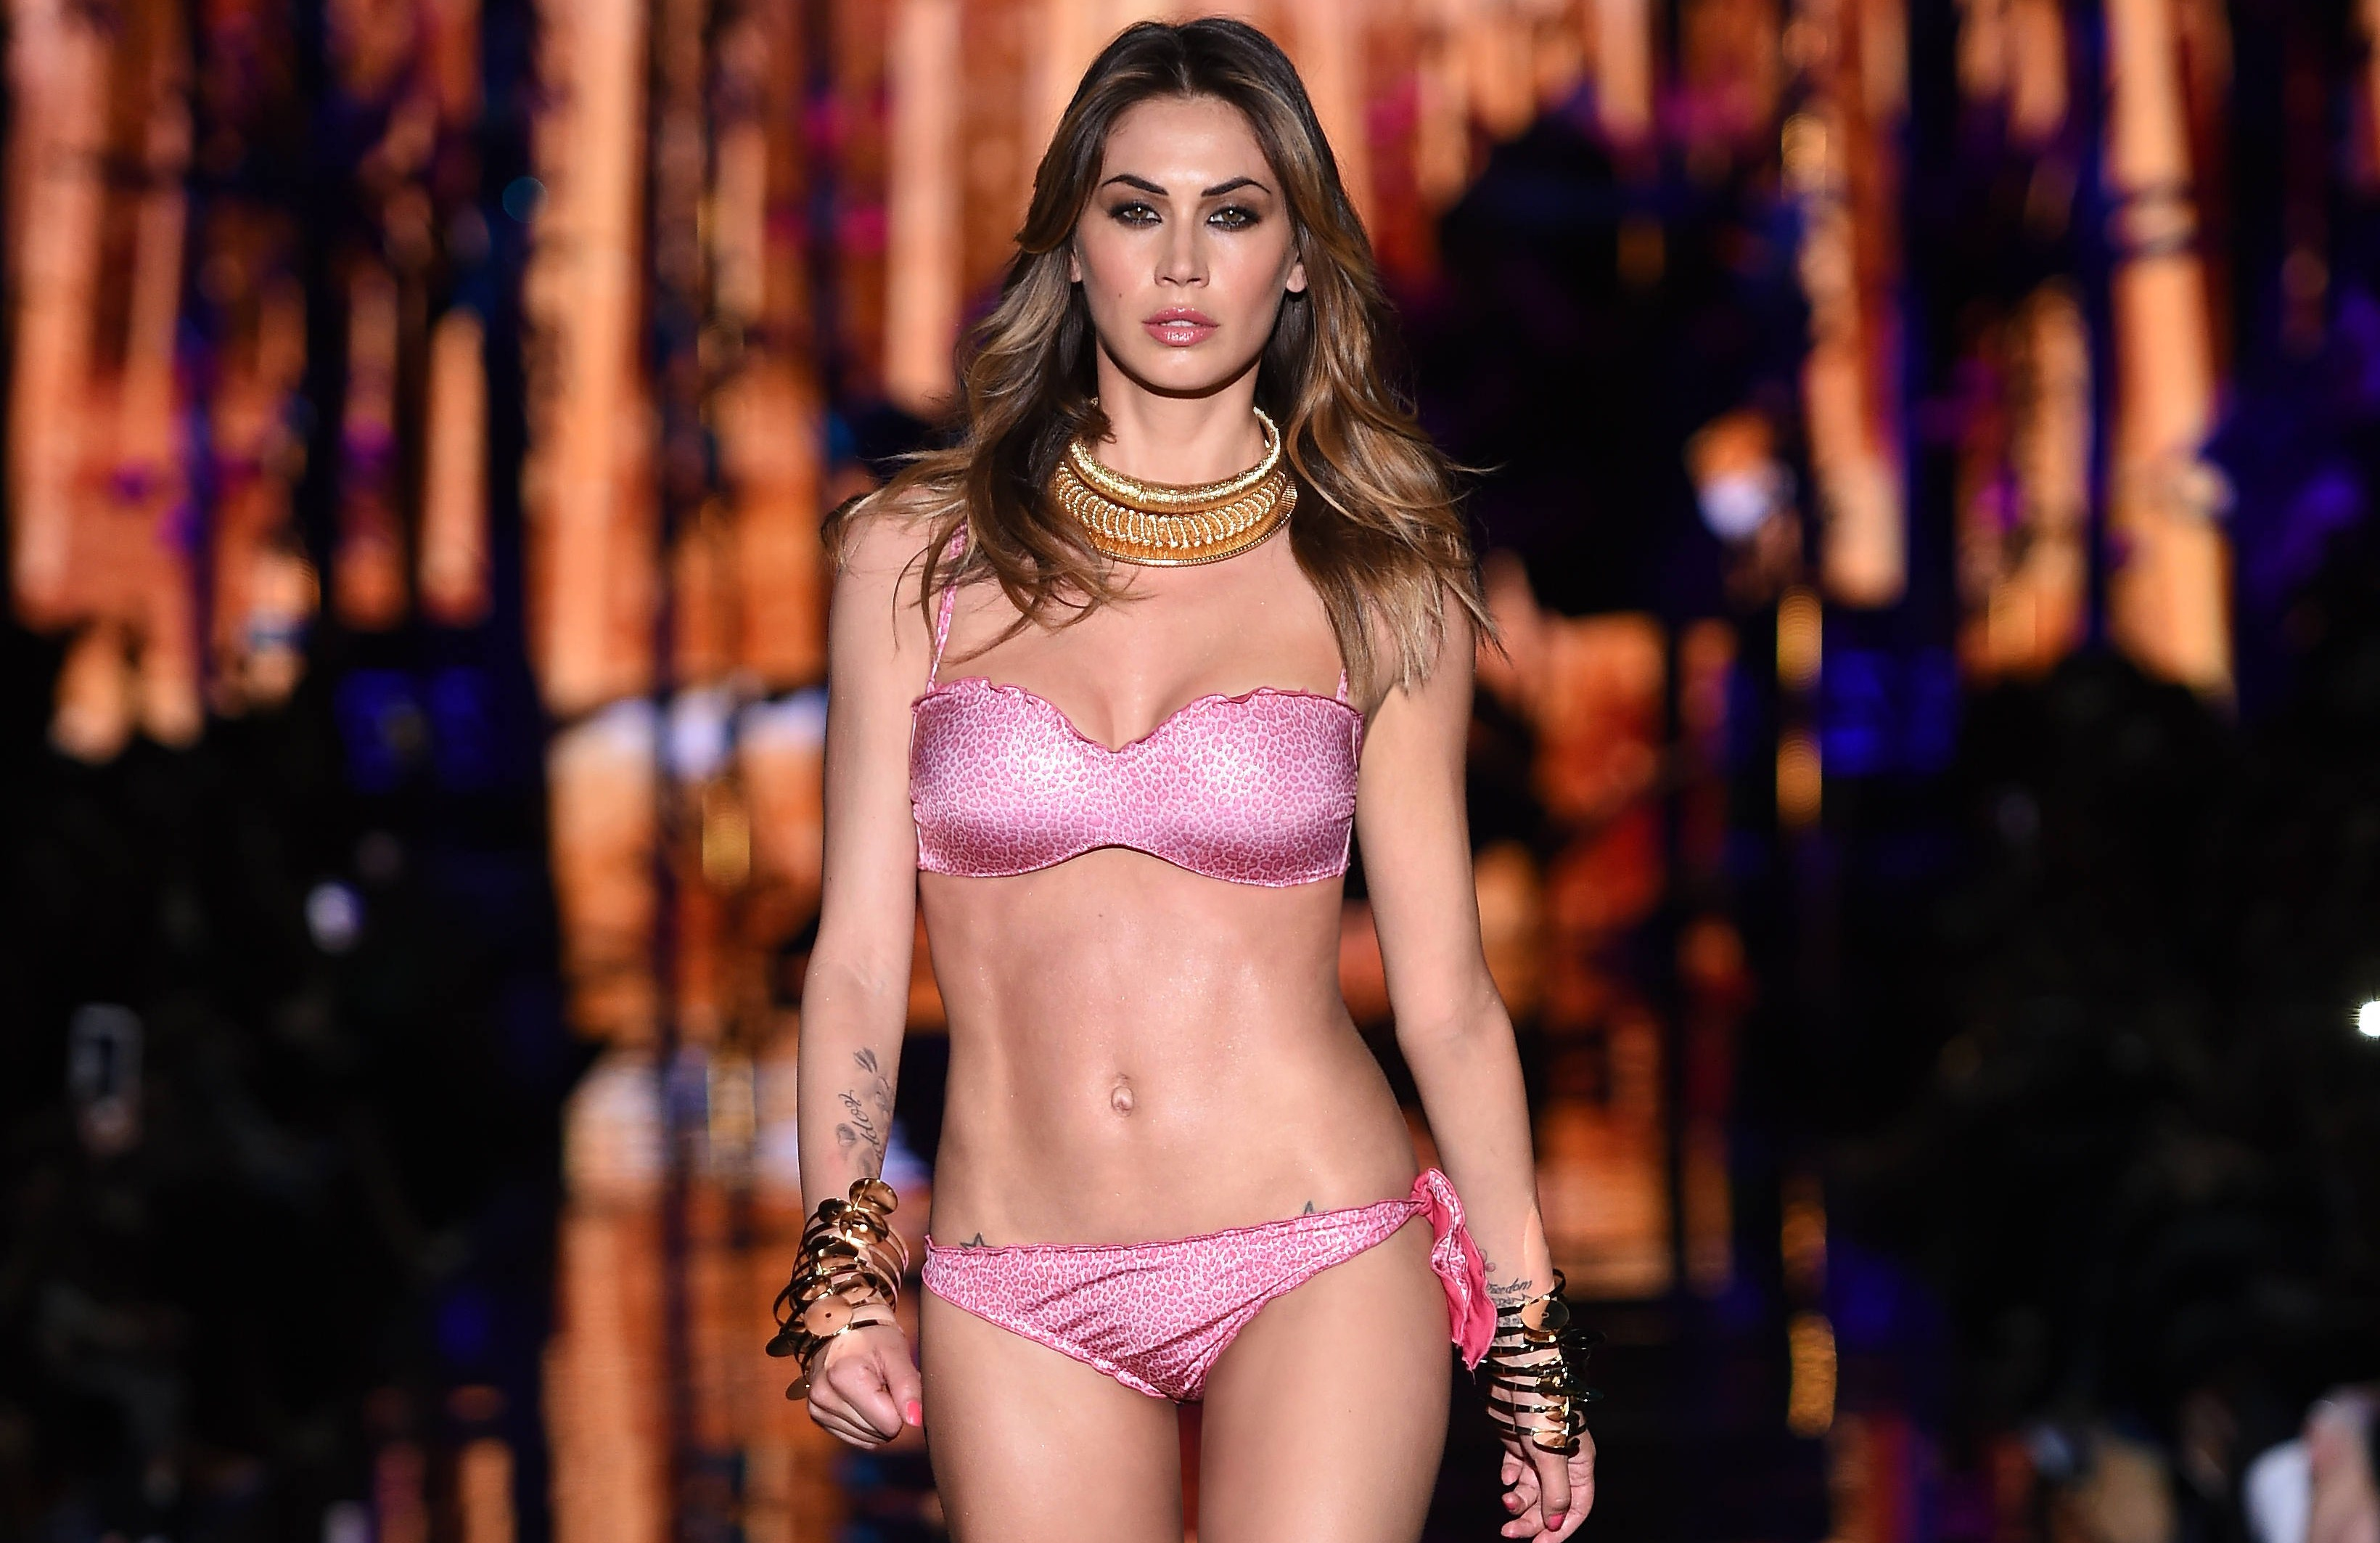 Hot Melissa Sata nude photos 2019